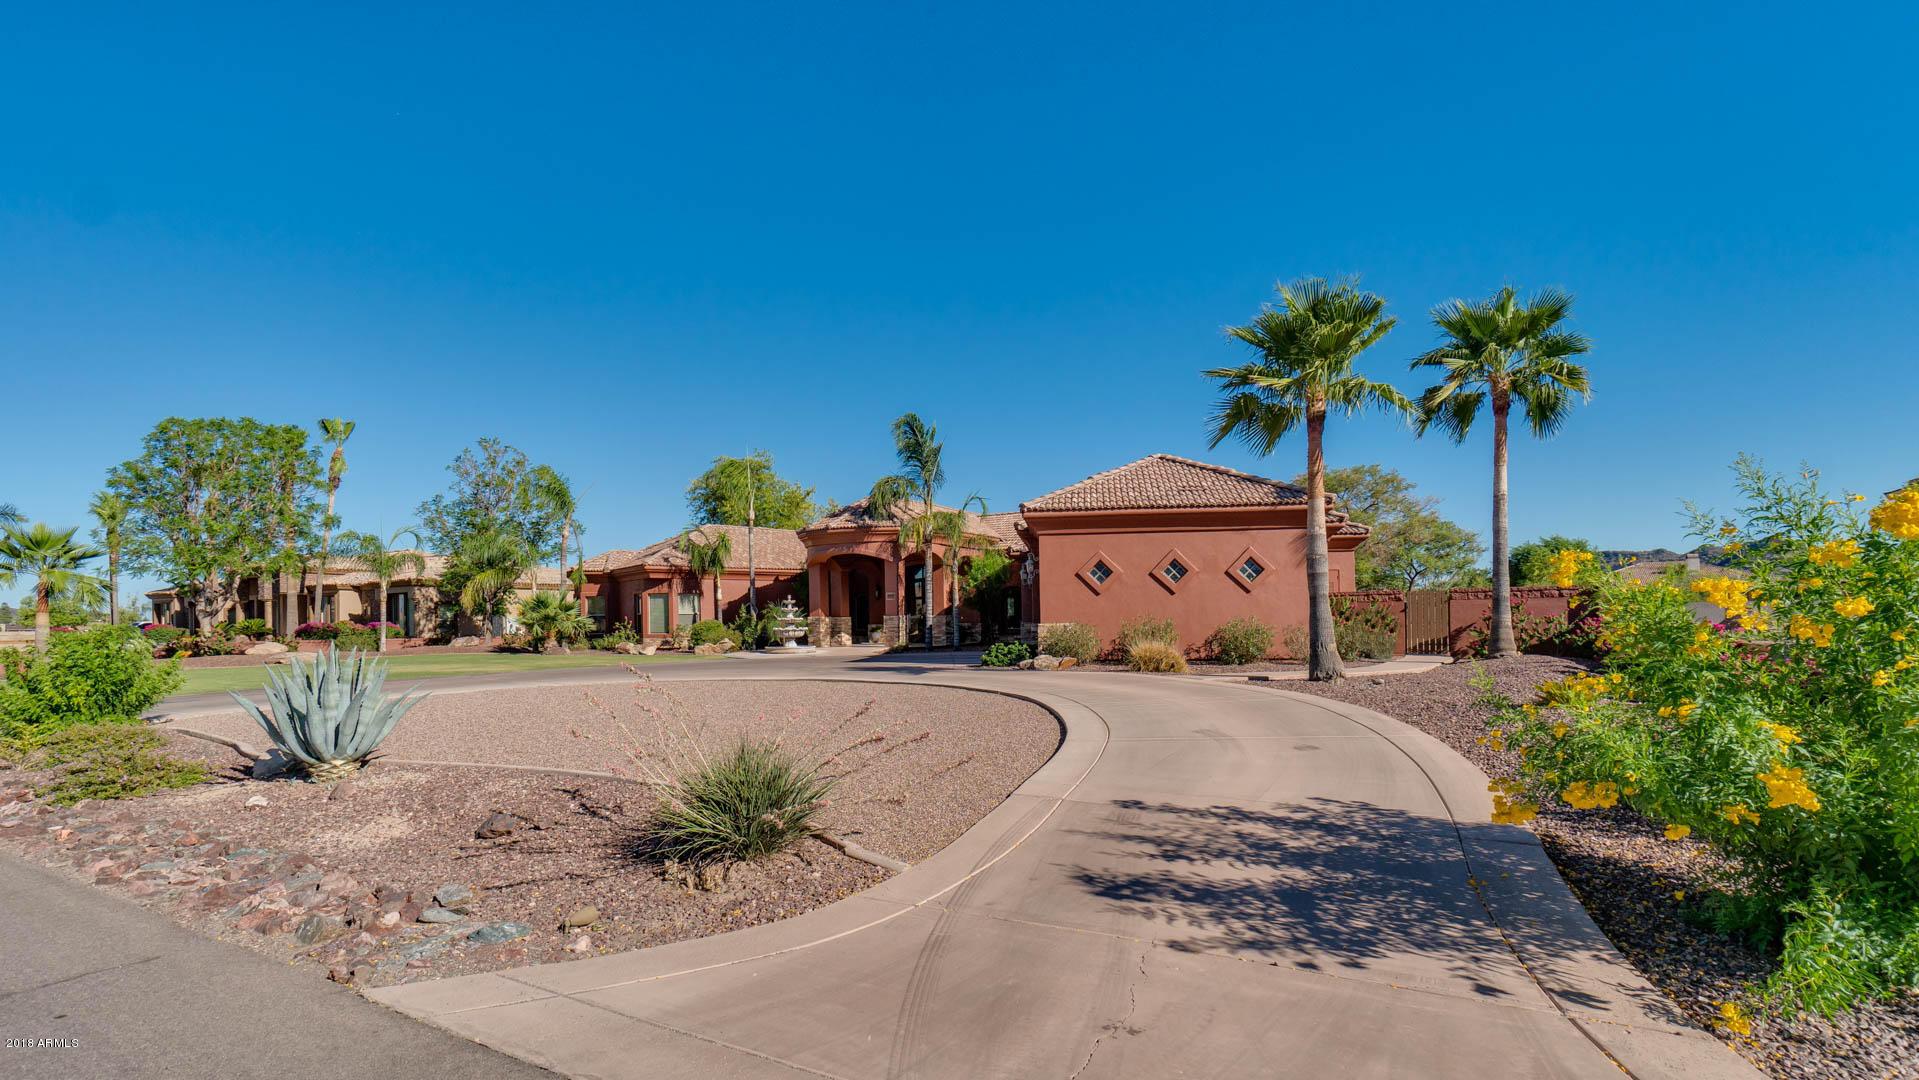 MLS 5821102 4721 W CREEDANCE Boulevard, Glendale, AZ 85310 Glendale